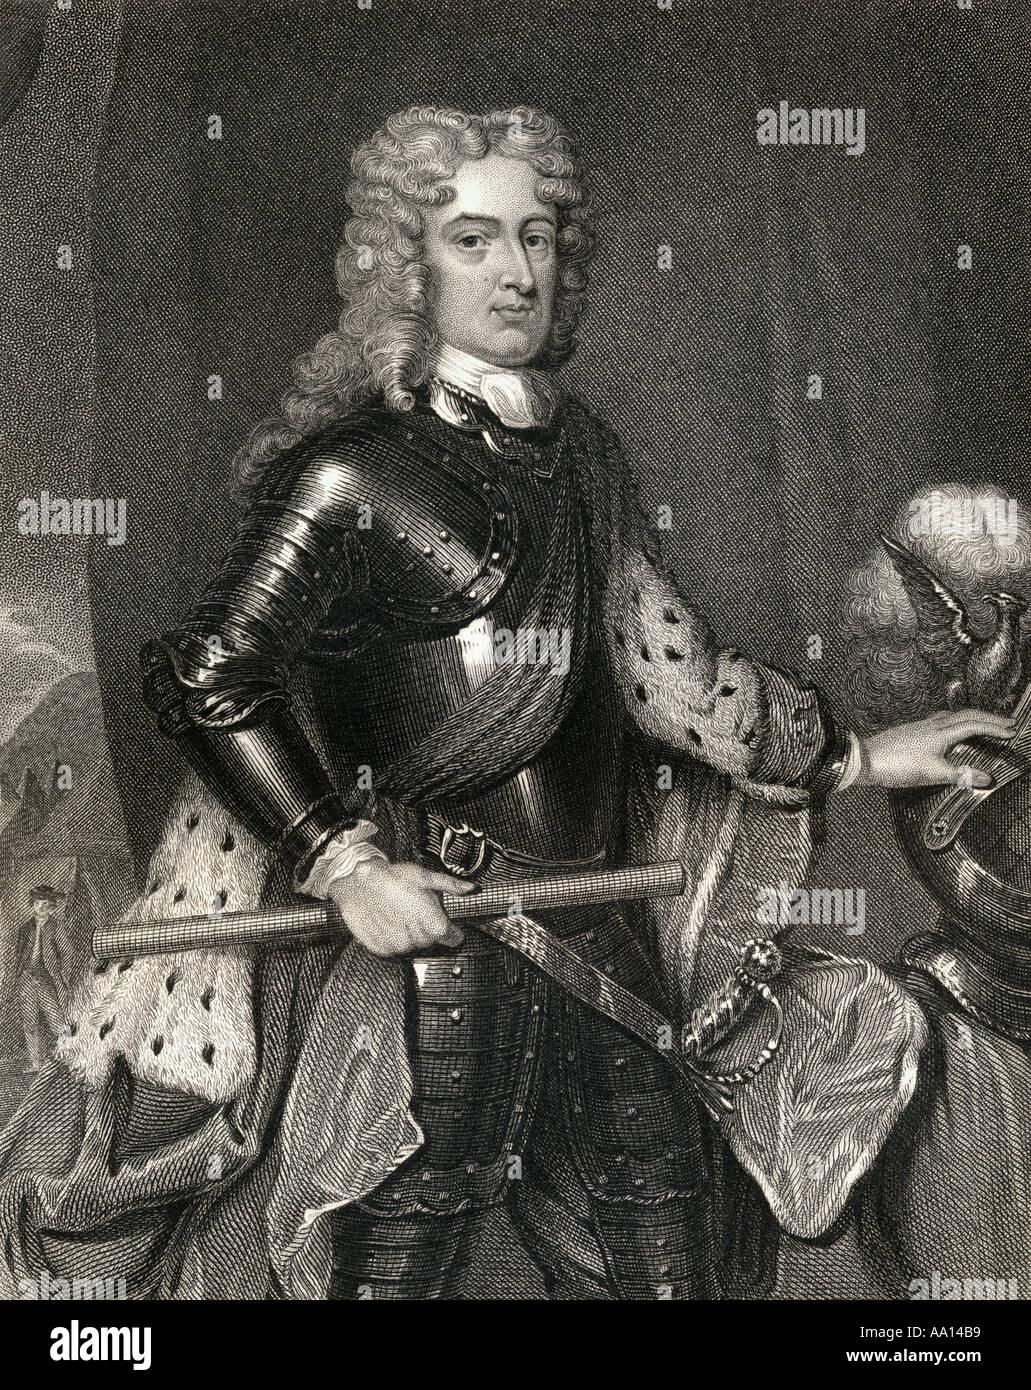 General John Churchill, 1st Duke of Marlborough, 1650-1722. English soldier and statesman. - Stock Image